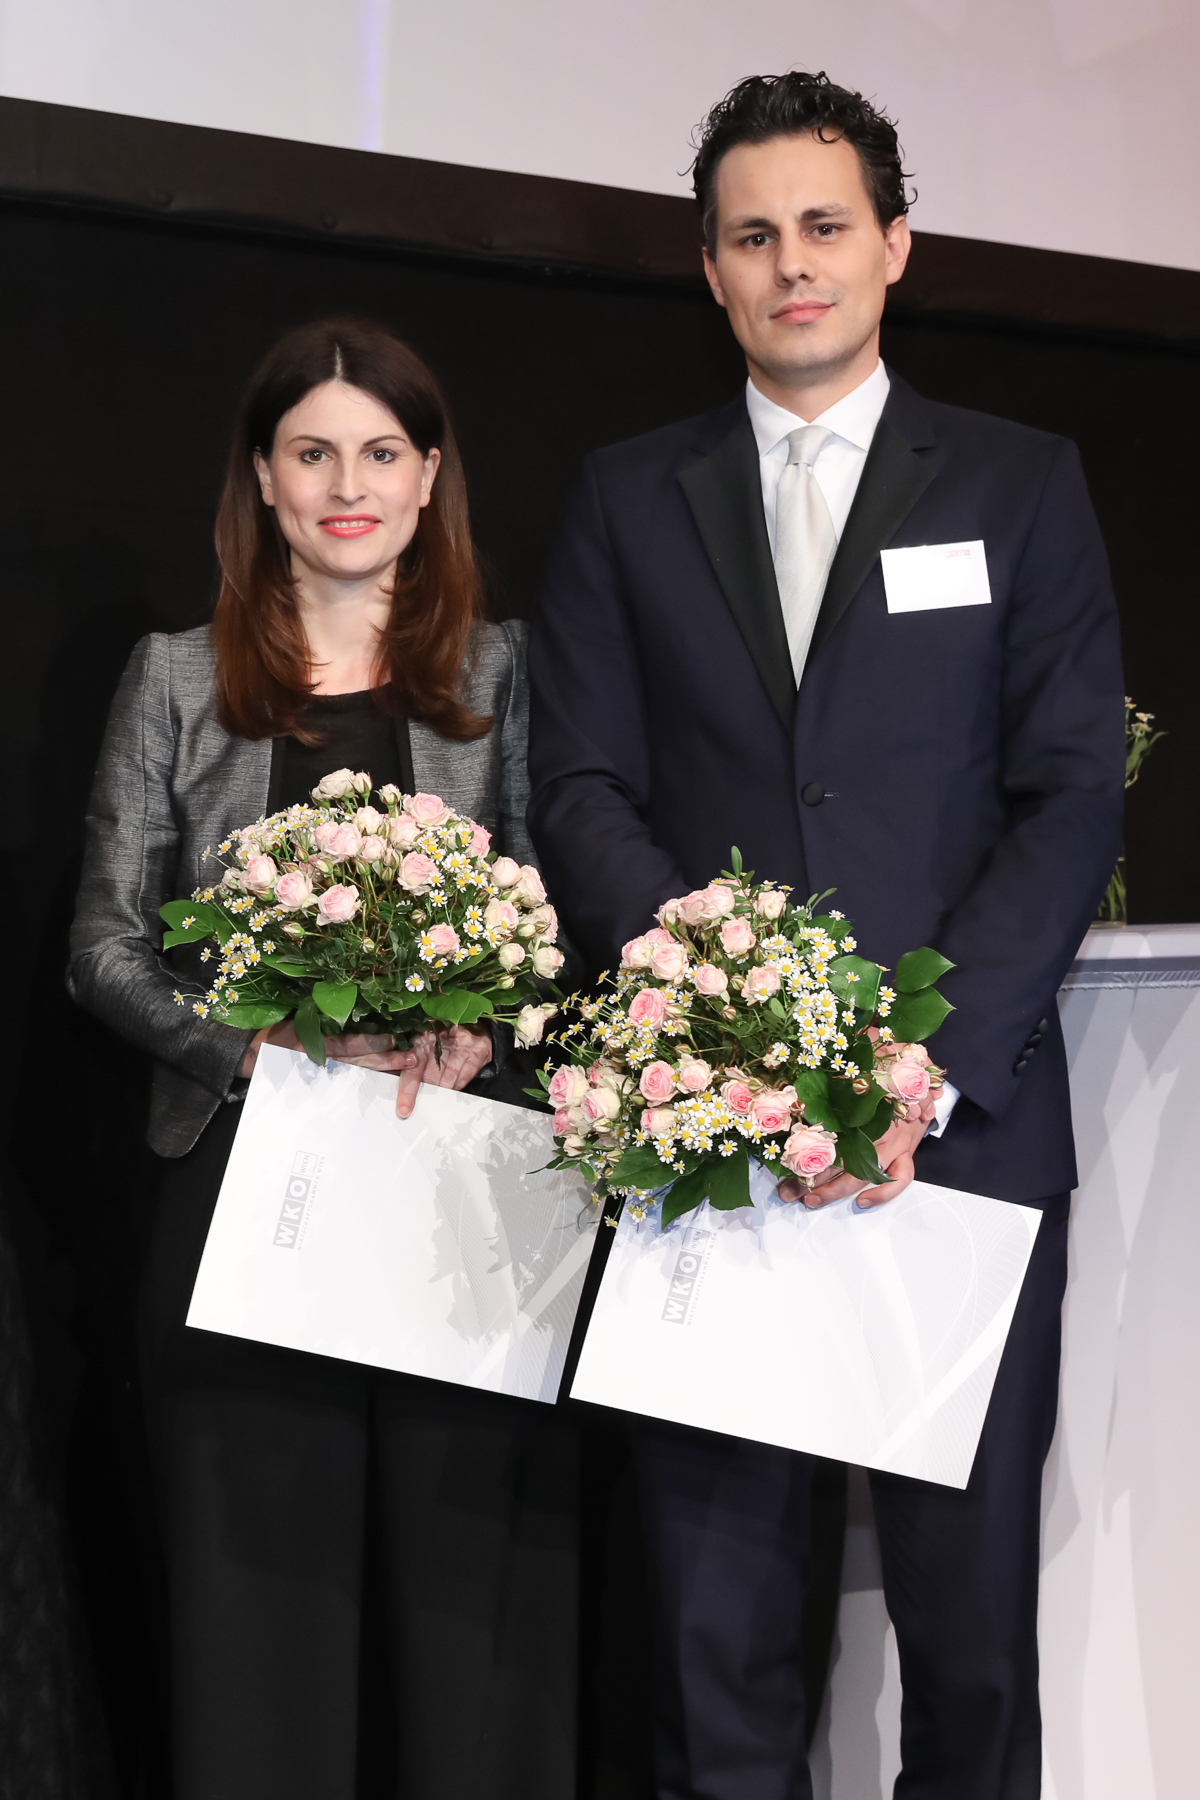 Hammurabi recognition prize for BVW graduate Sandra Annerer